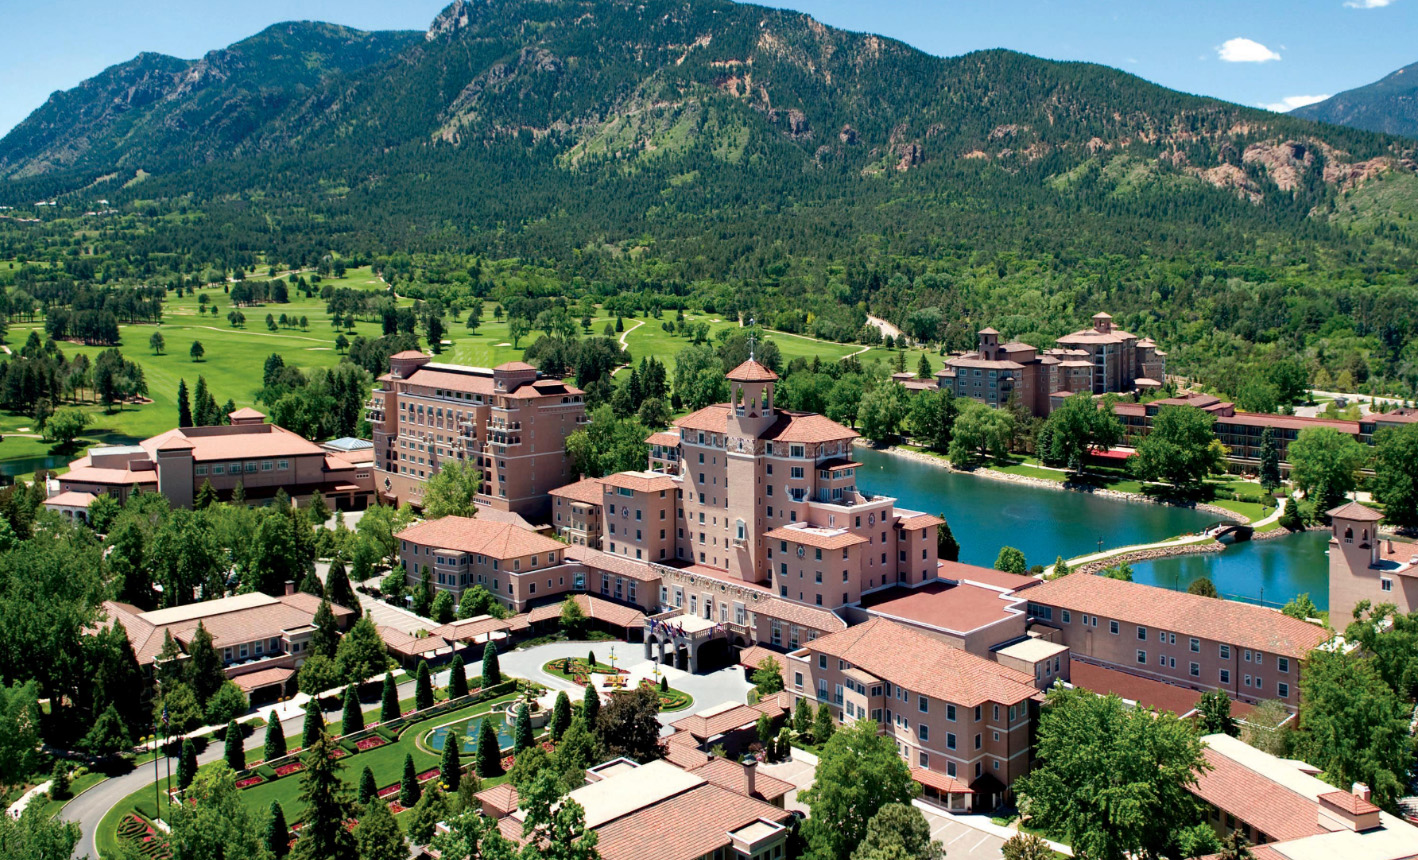 Hotels Near The Broadmoor Colorado Springs Co